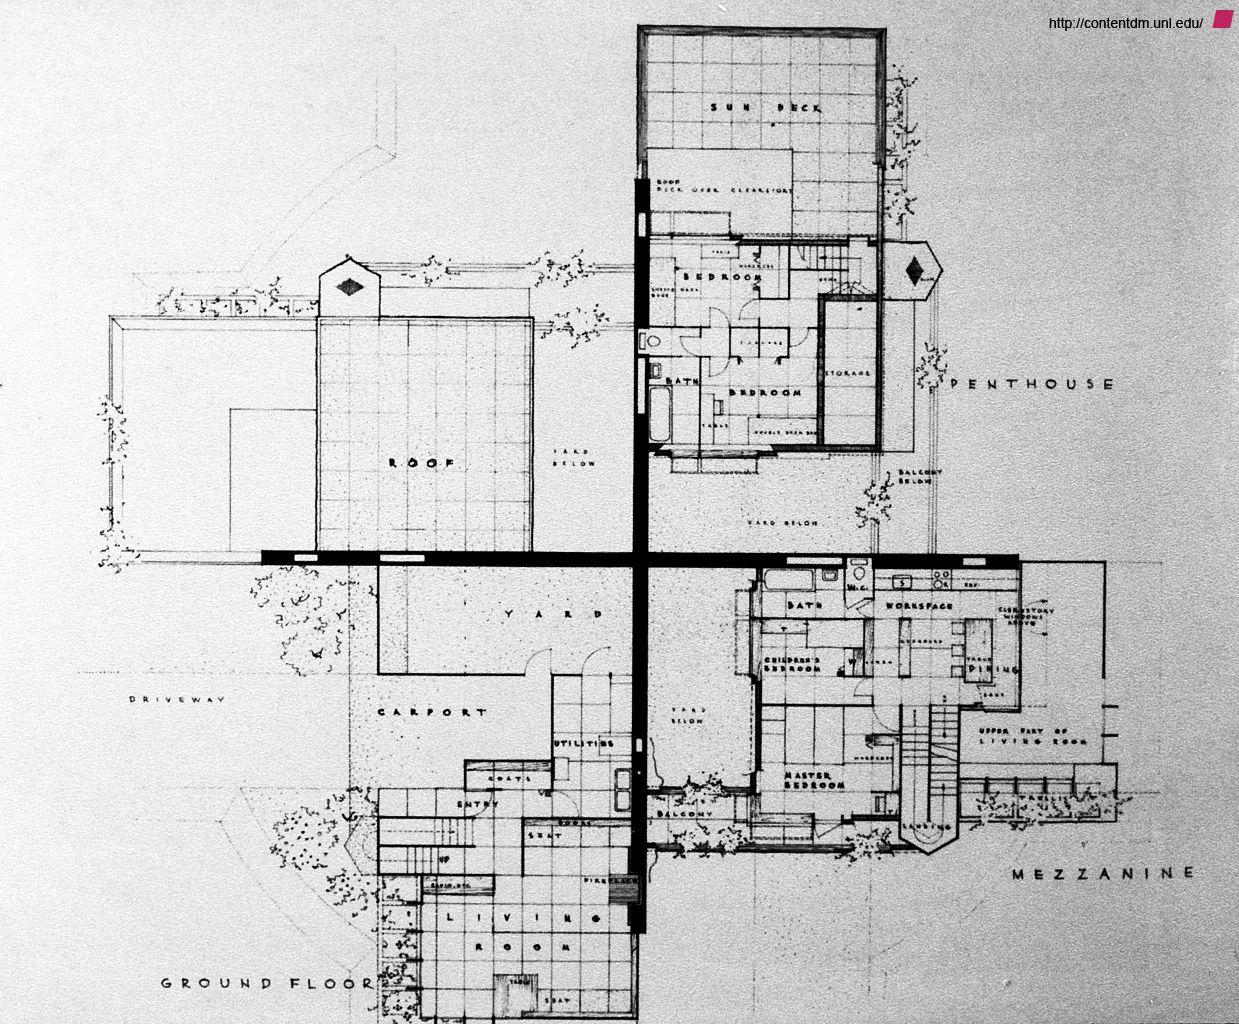 cloverleaf_quadruple_housing_39486642_02.jpg (1239×1024) | mimari ...